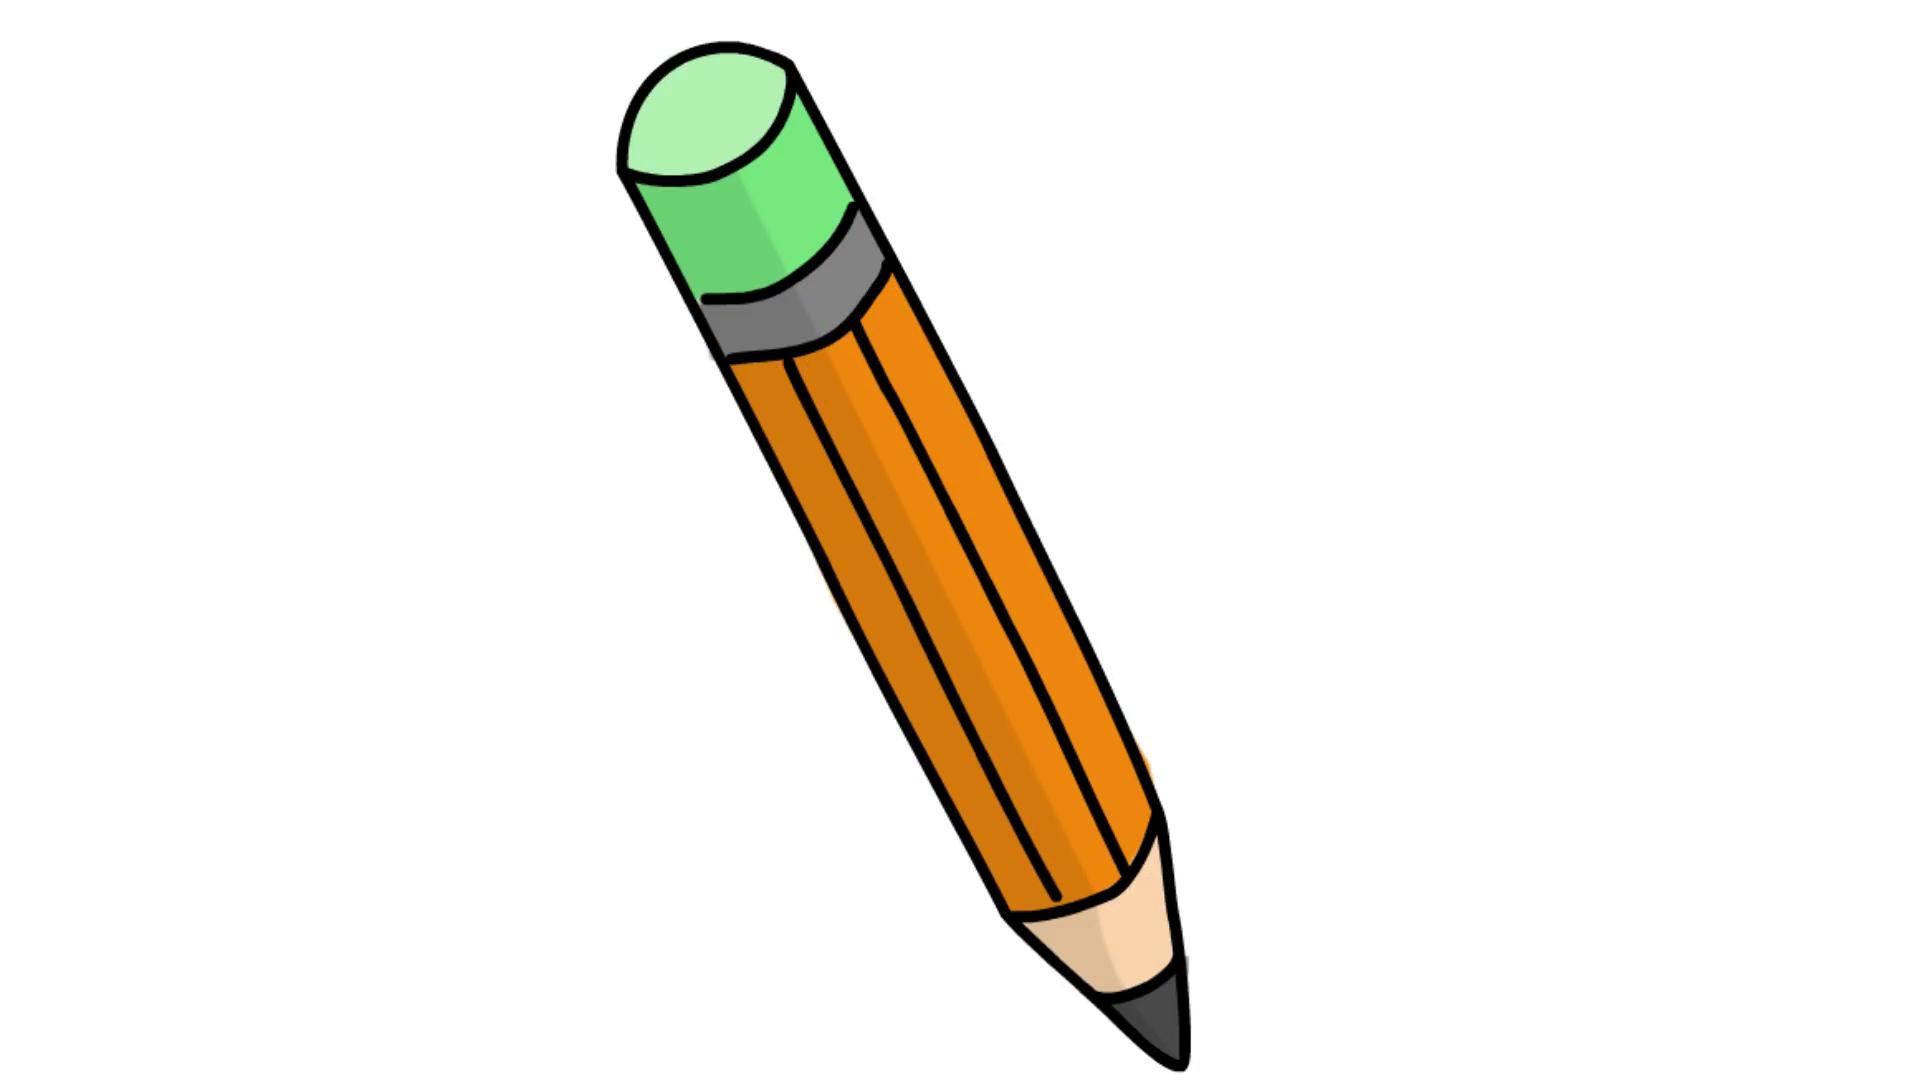 pencil animation.